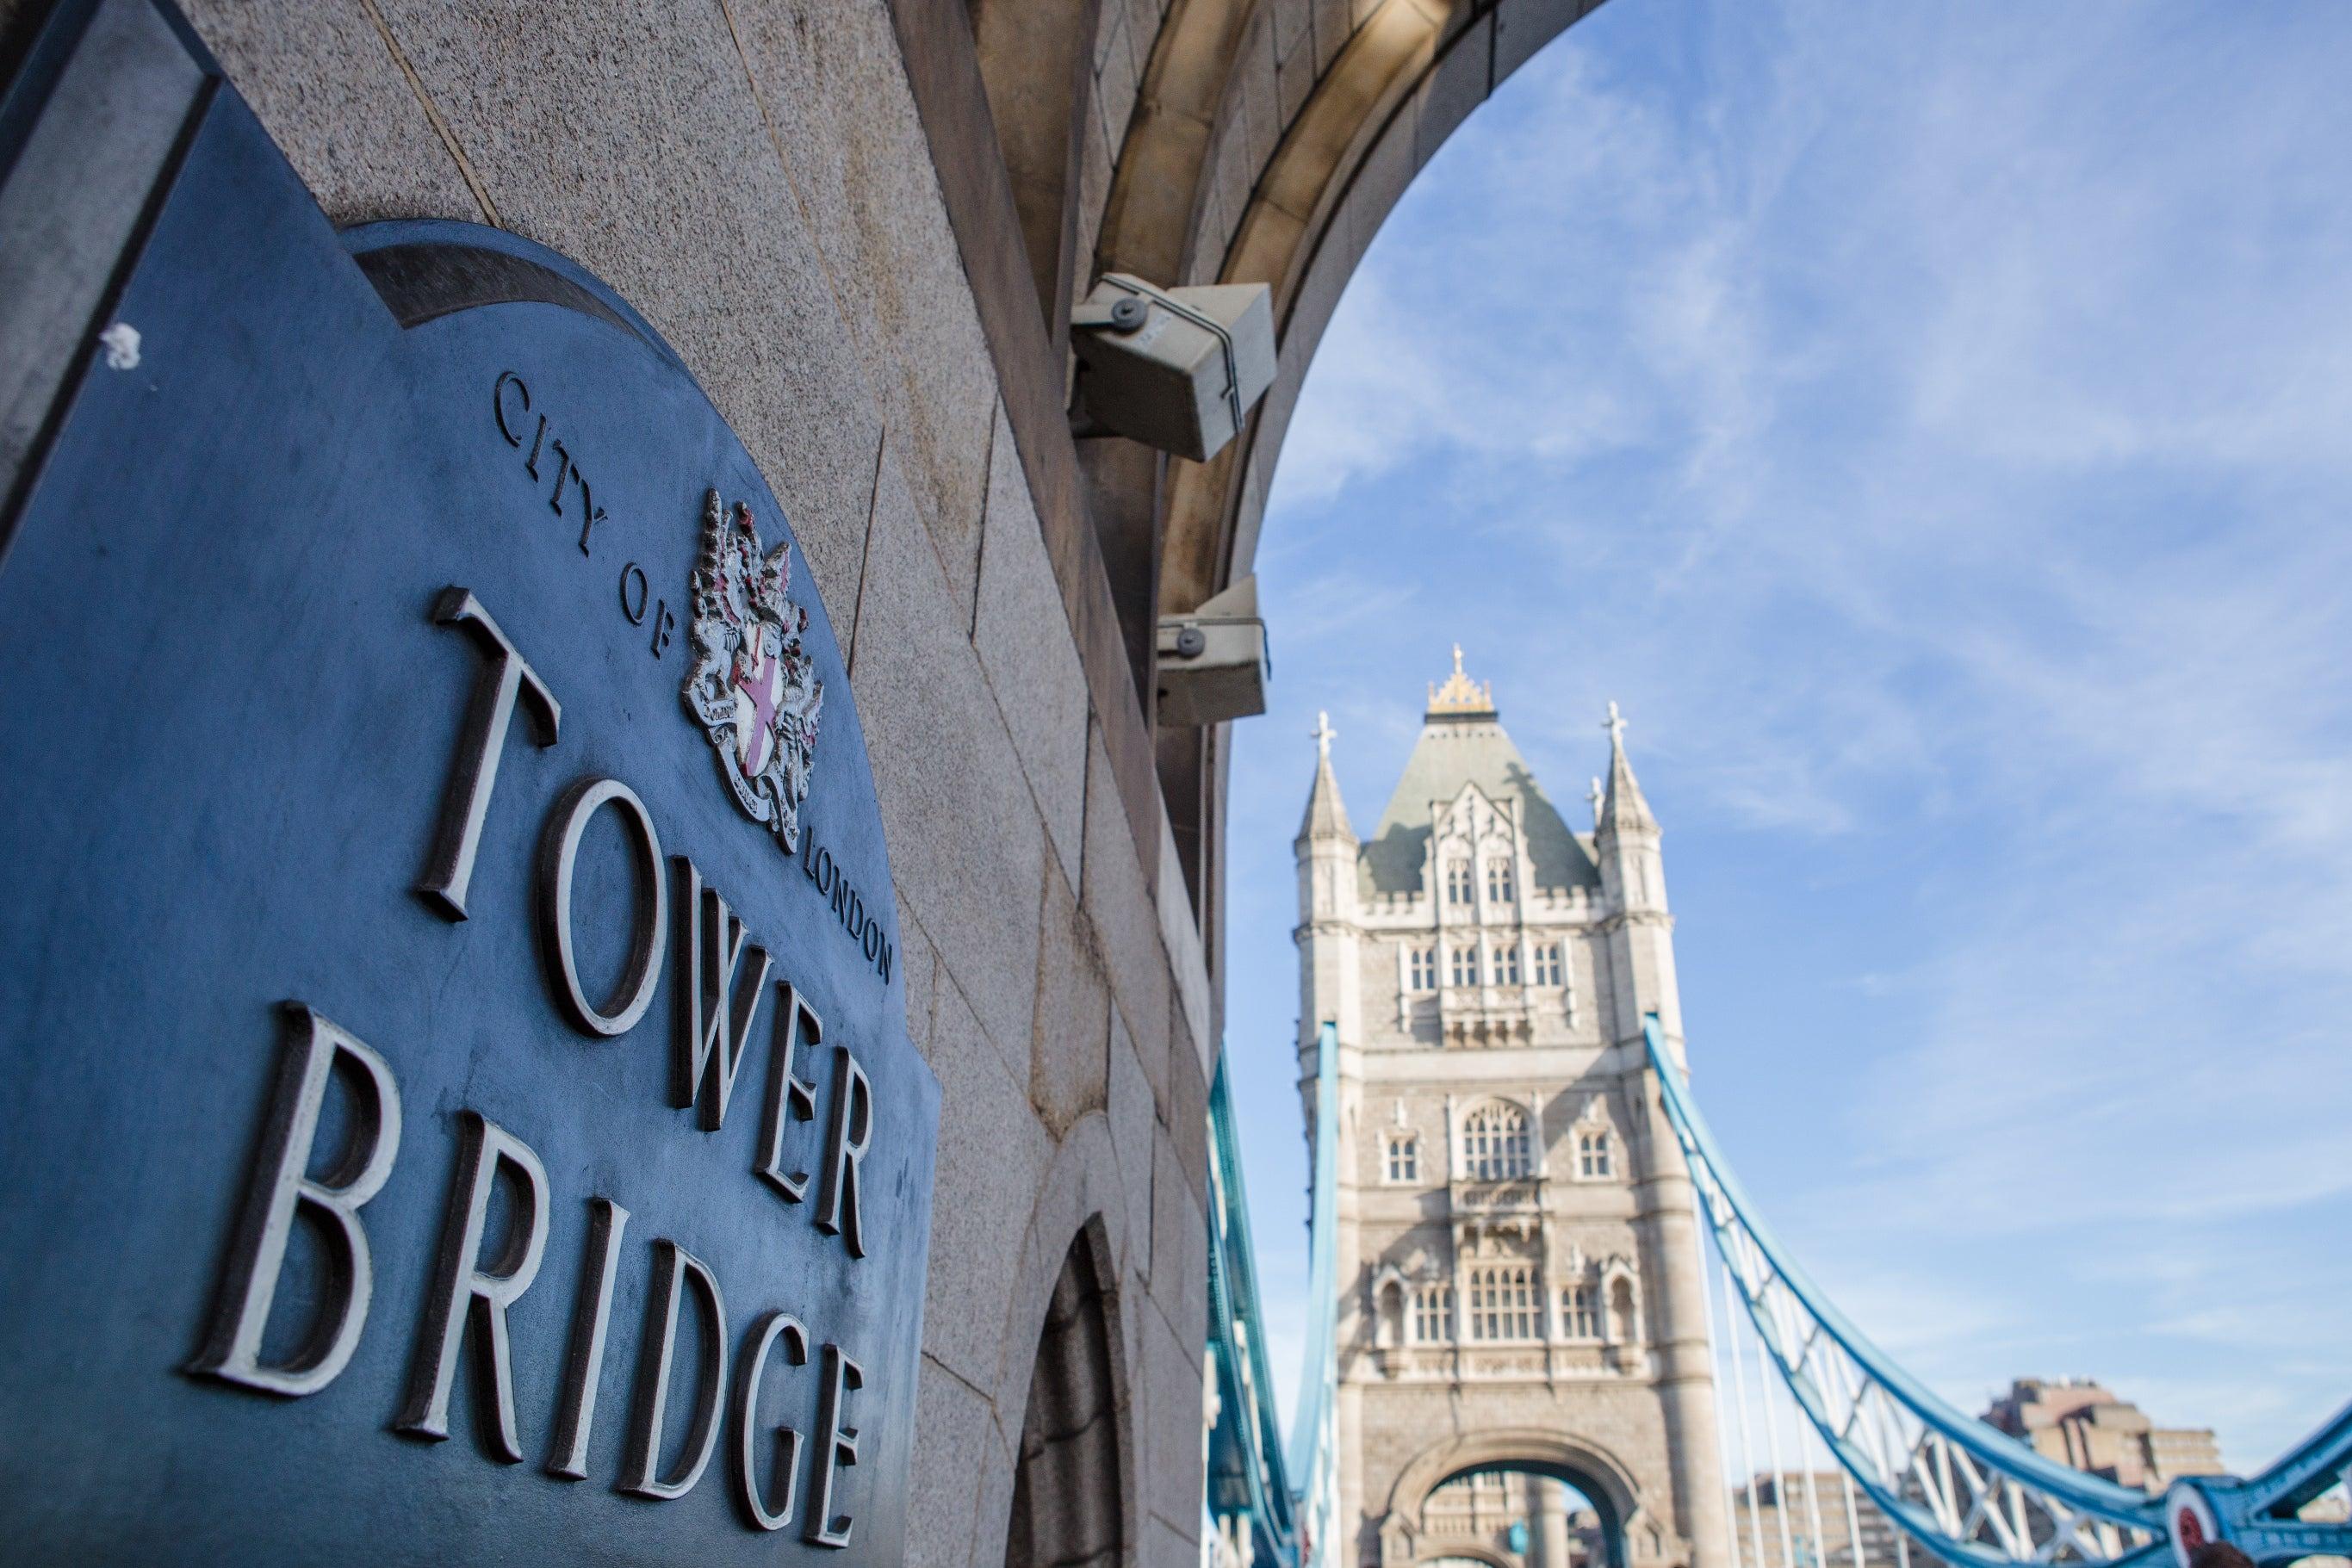 Tower Bridge & The Monument